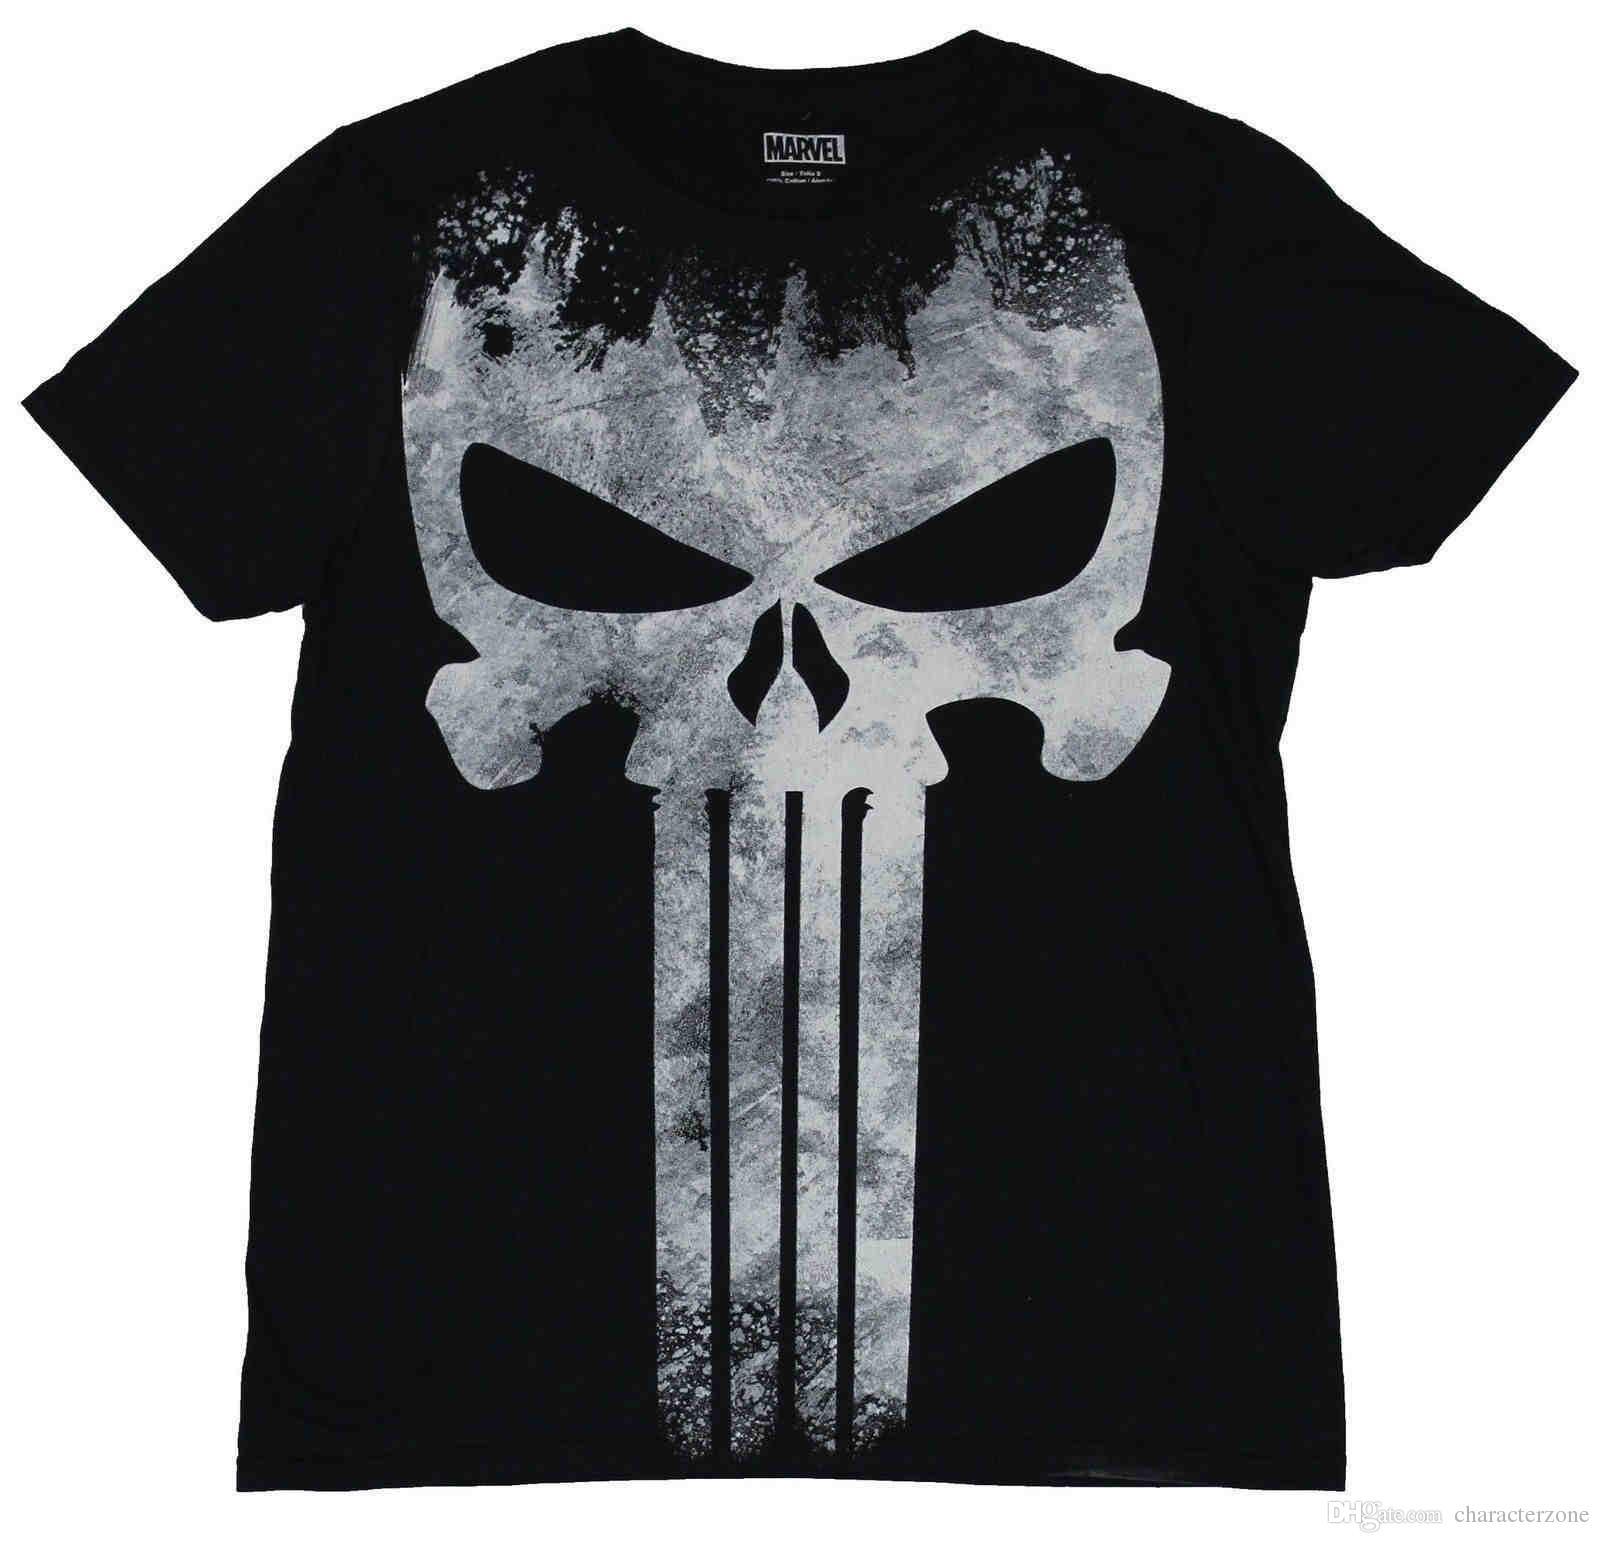 Compre Camiseta Para Hombre The Punisher Marvel Comics Castigadora Apenada  Blanca Gigante A  10.45 Del Diyteemall  ce1f1318345